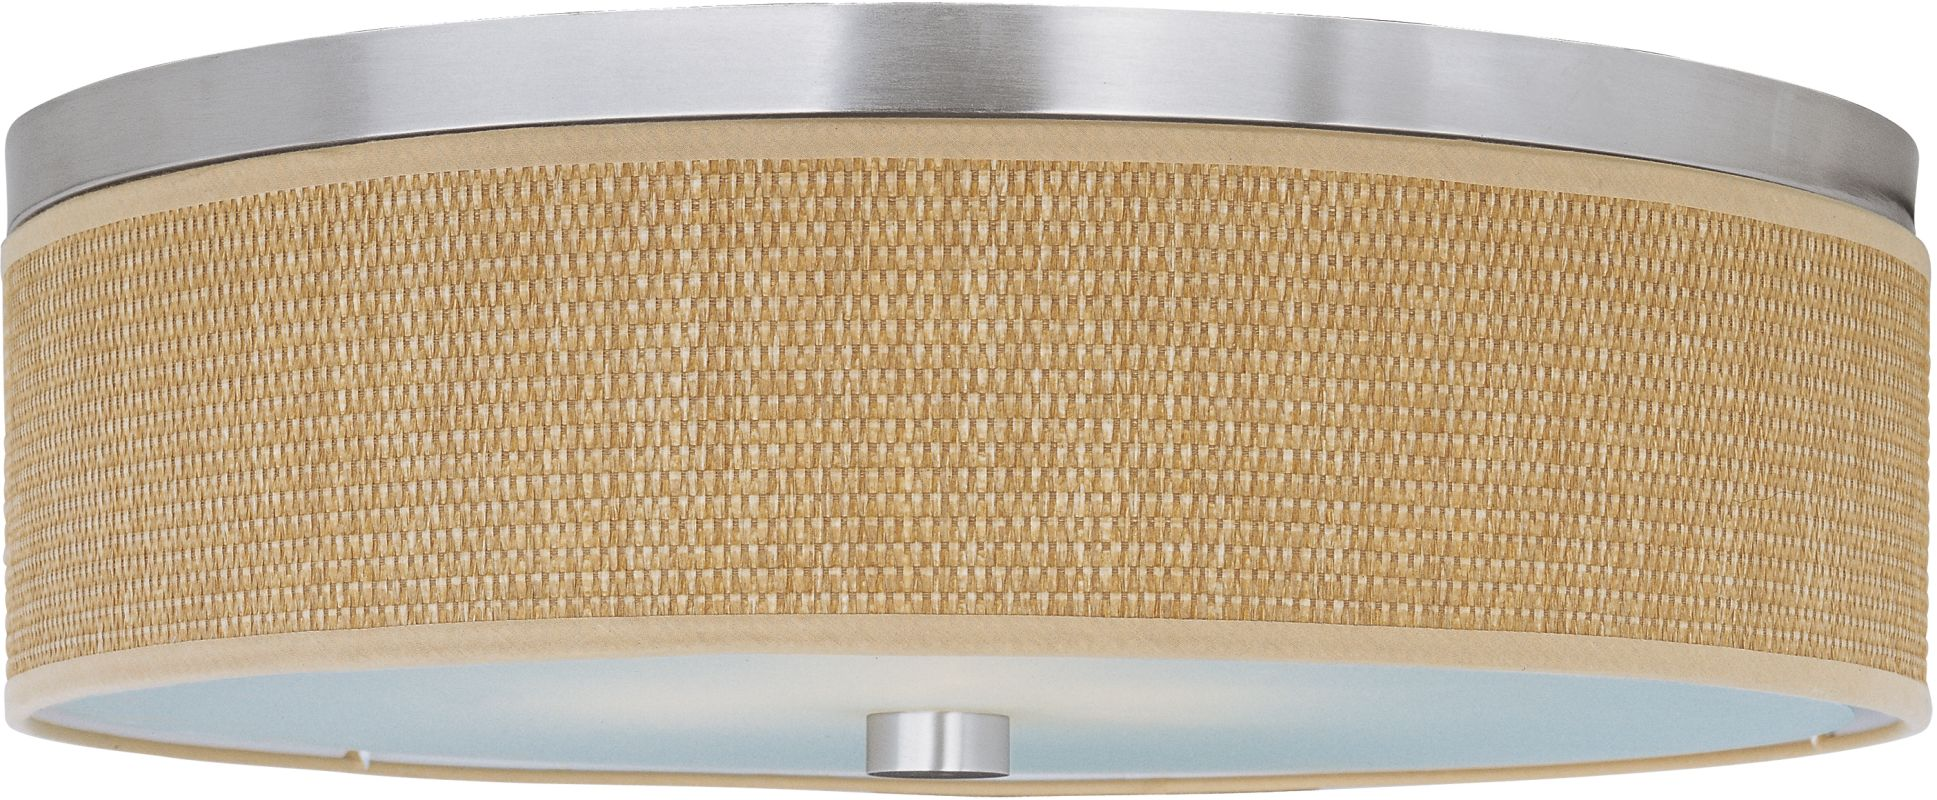 ET2 E95104-101SN Satin Nickel Contemporary Elements Ceiling Light